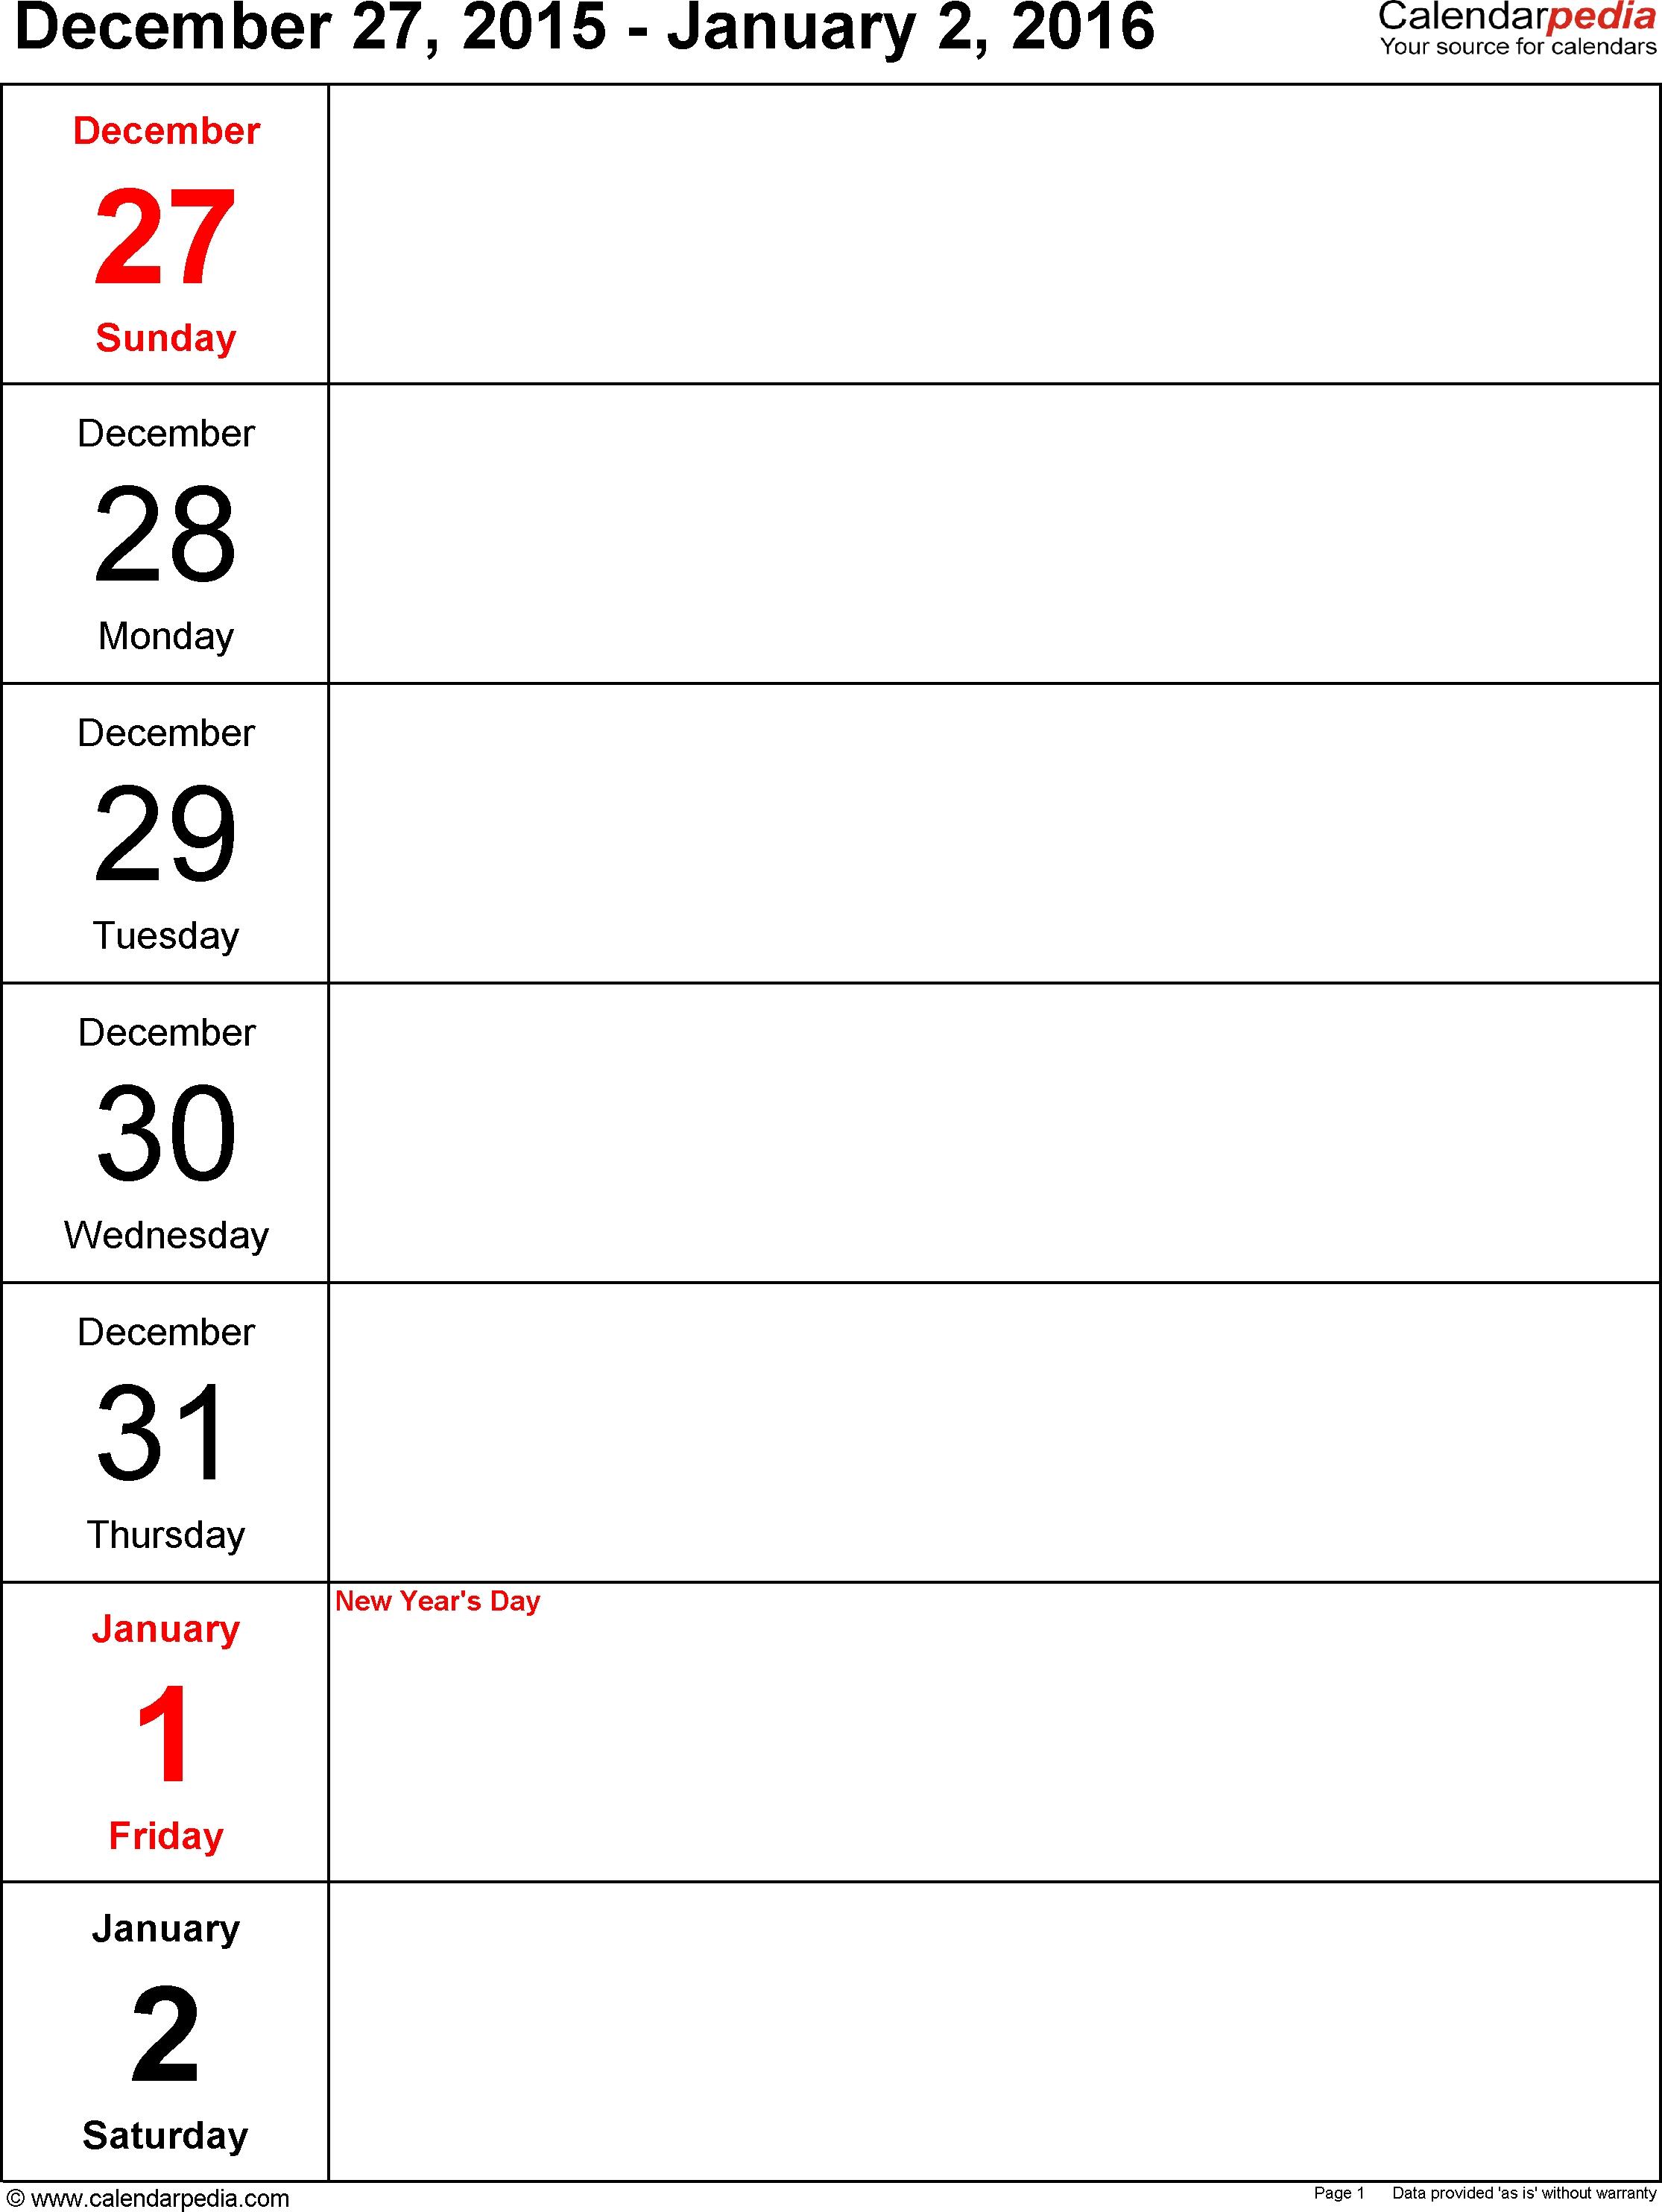 Weekly Calendar 2016 For Pdf - 12 Free Printable Templates regarding 1 Week Menu Calendar Template